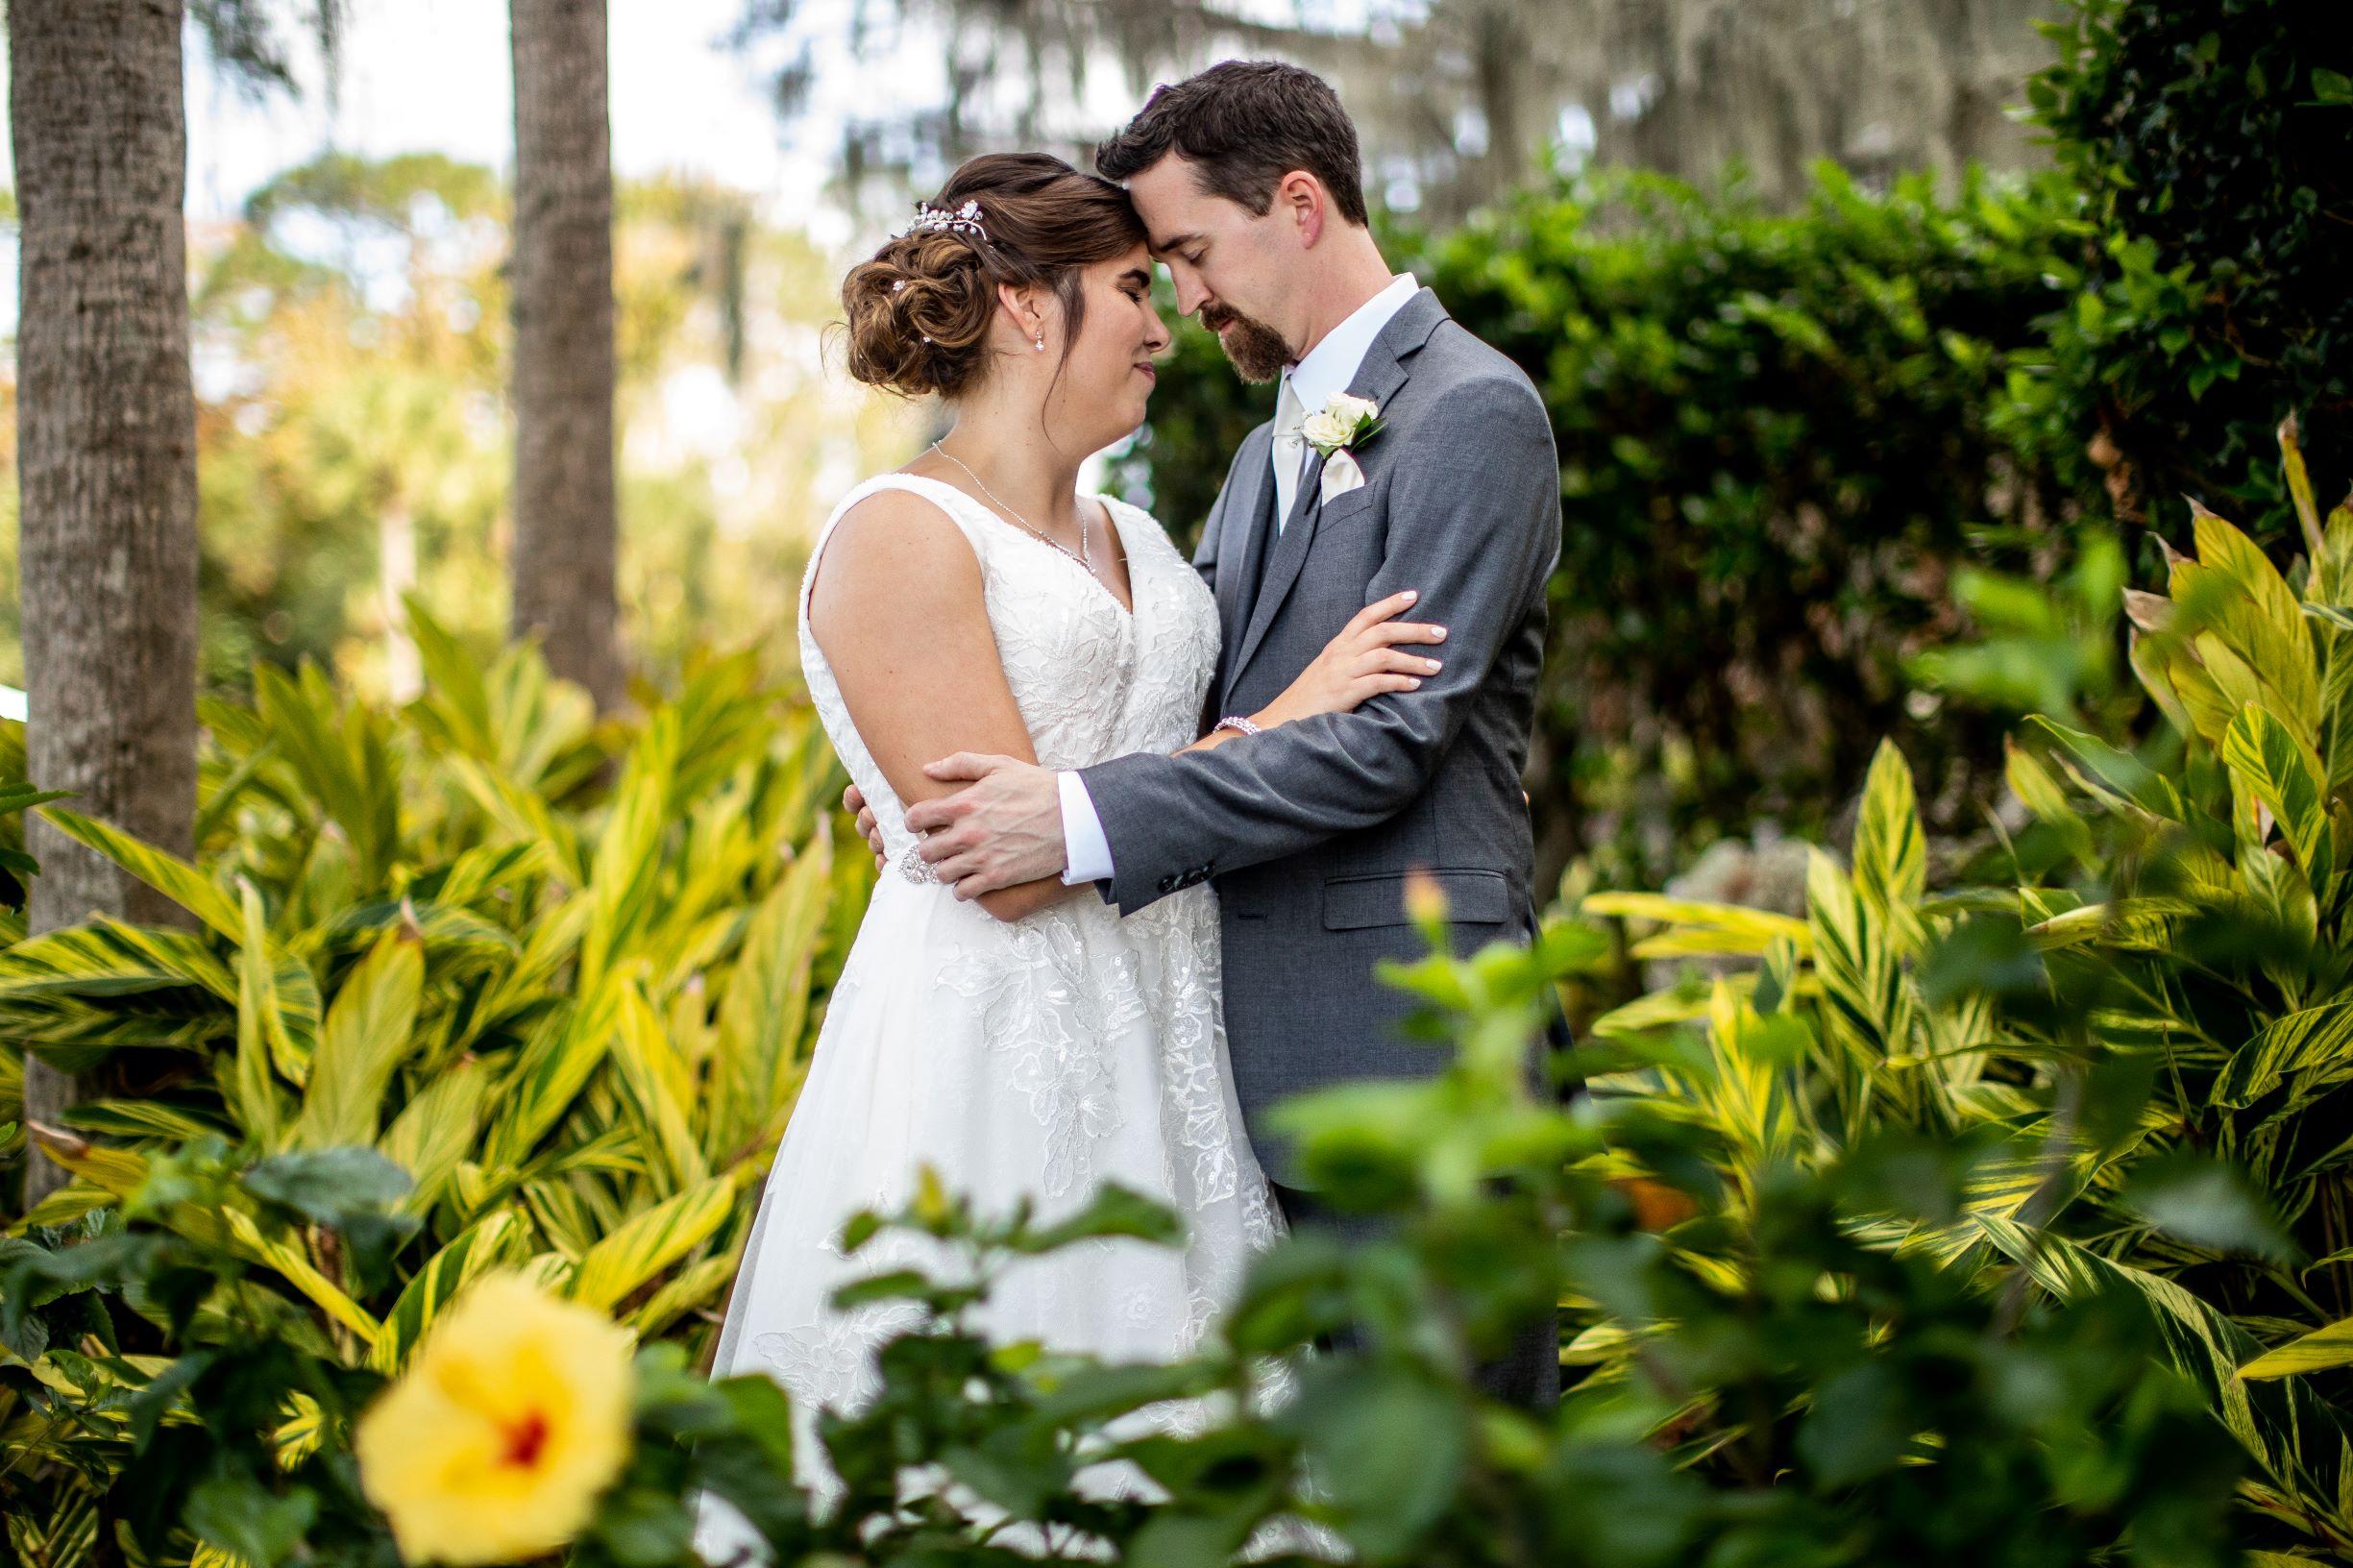 Orlando Wedding Venues | Nicole and John at the Hyatt Regency Grand Cypress